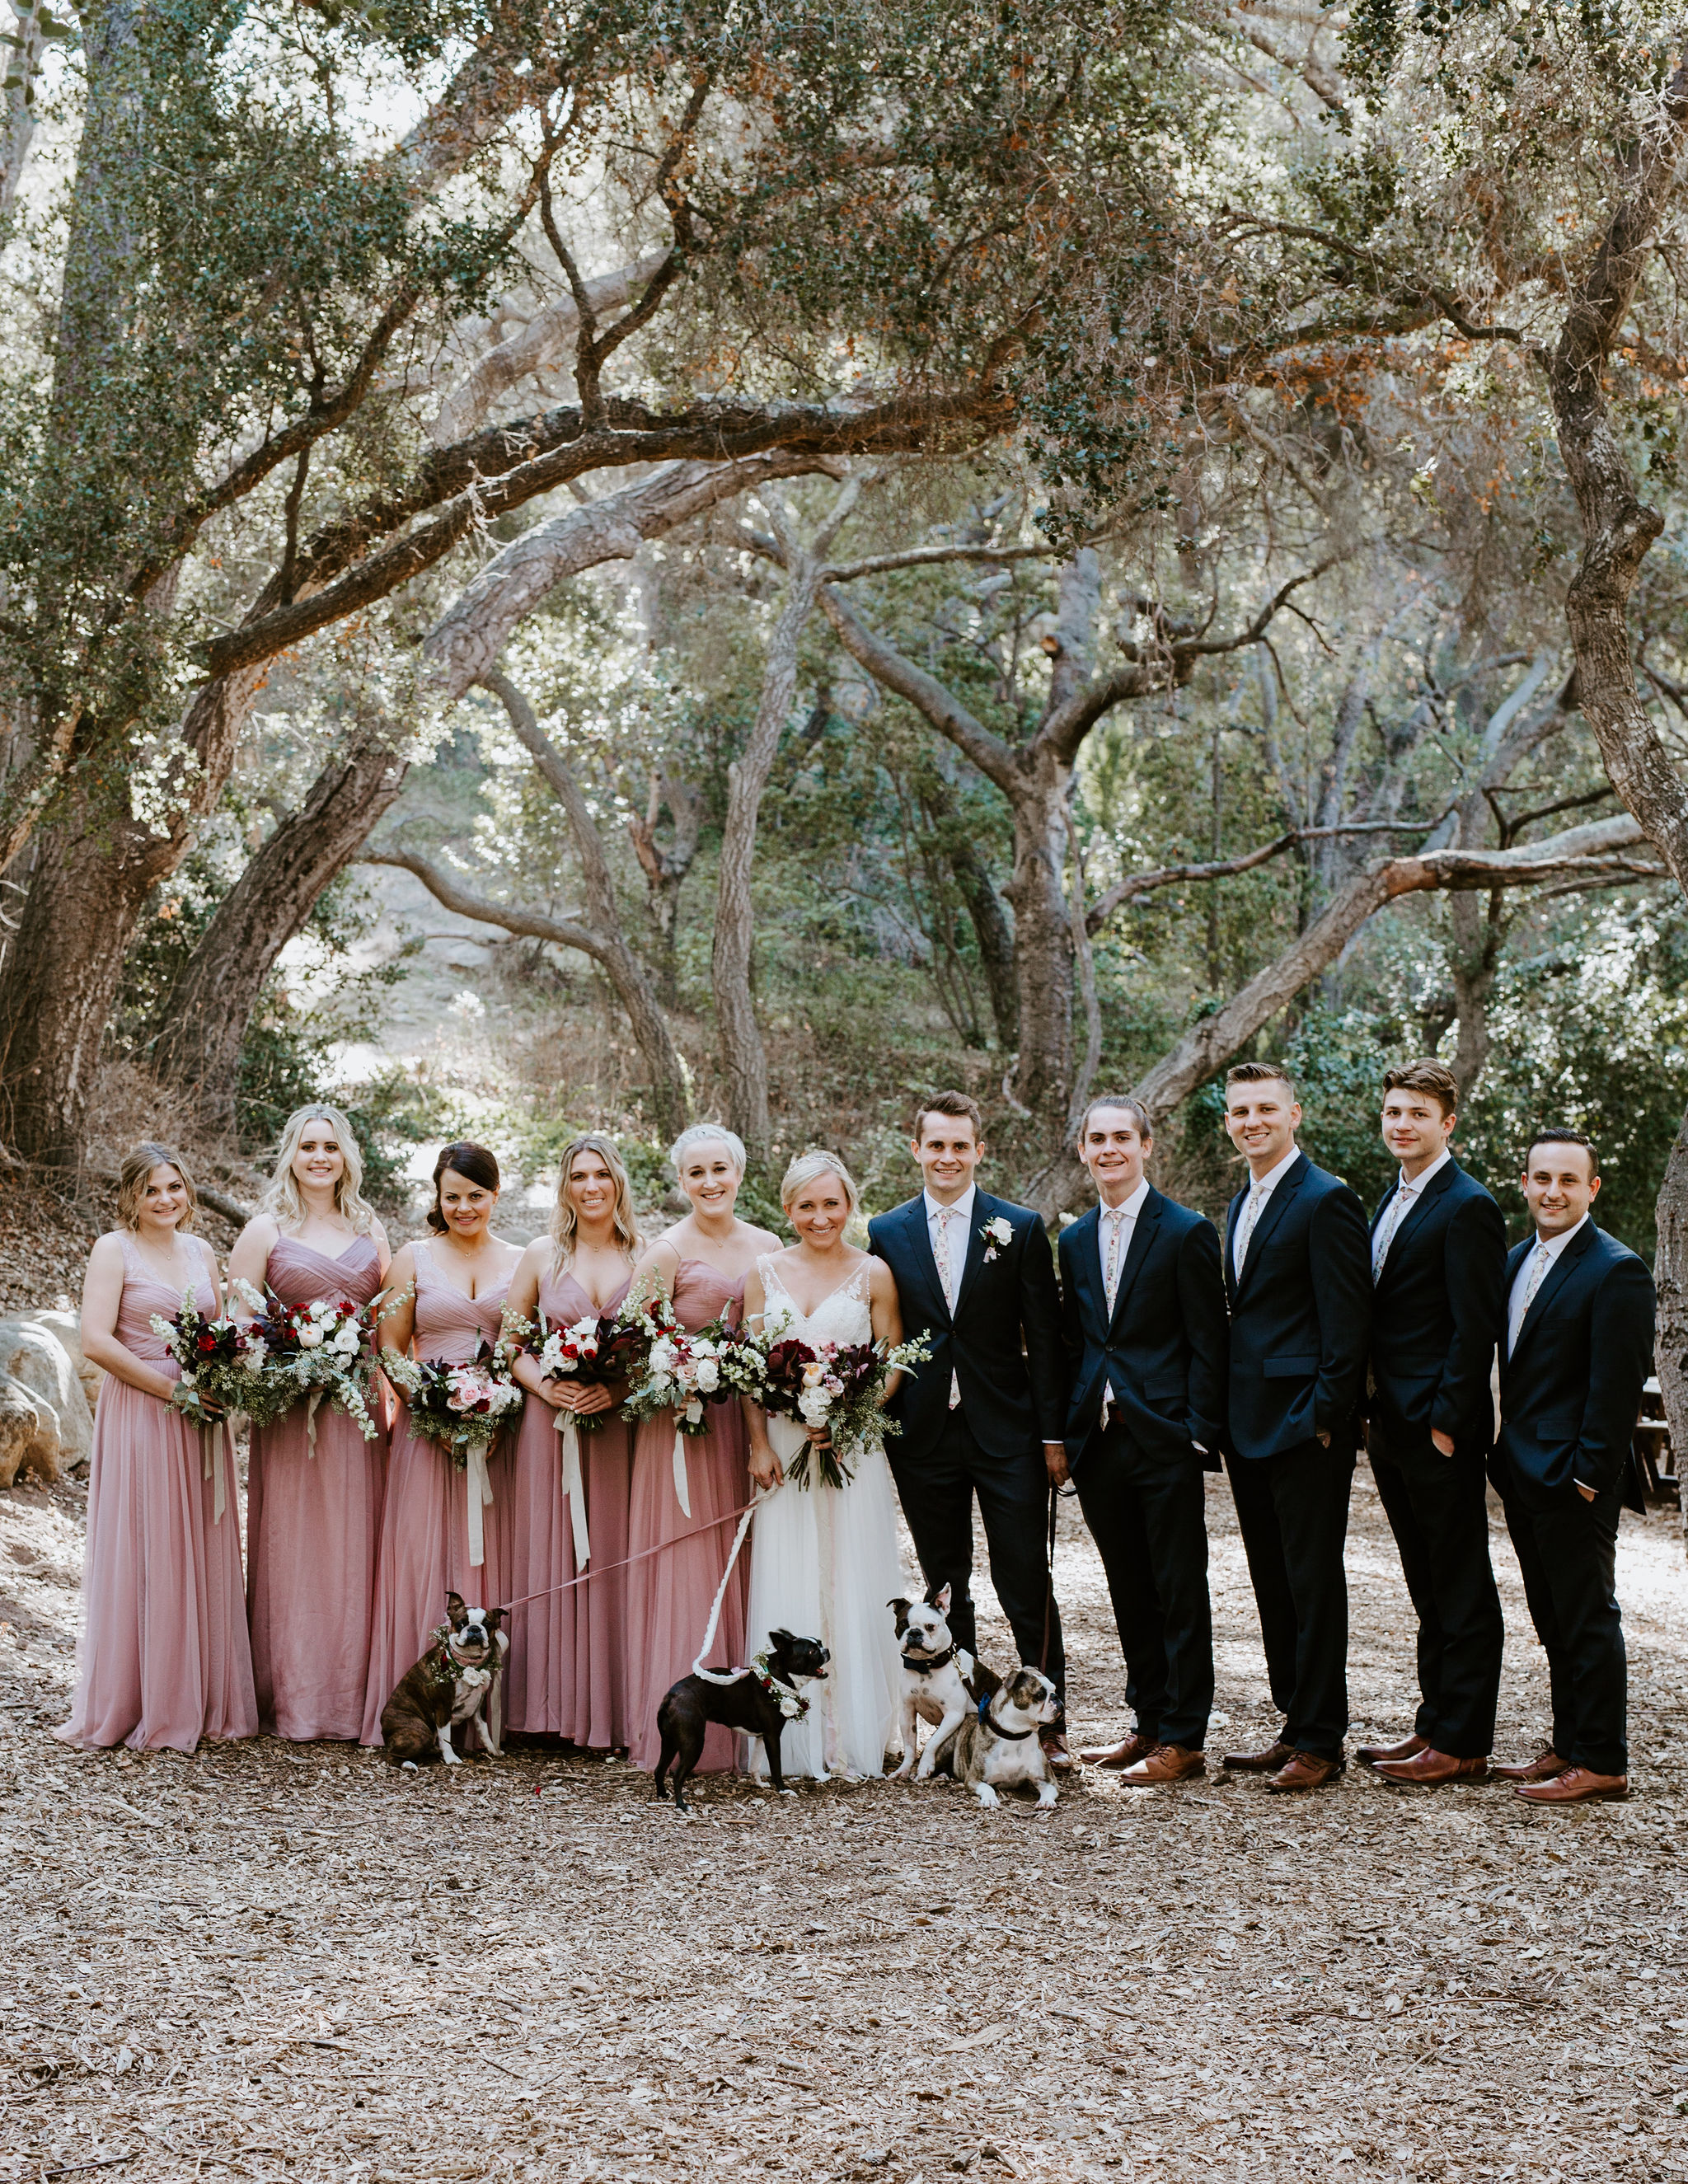 SantaBarbaraMuseumofNaturalHistoryWedding_Geoff&LyndsiPhotography_Madi&Mike_WeddingParty11.jpg